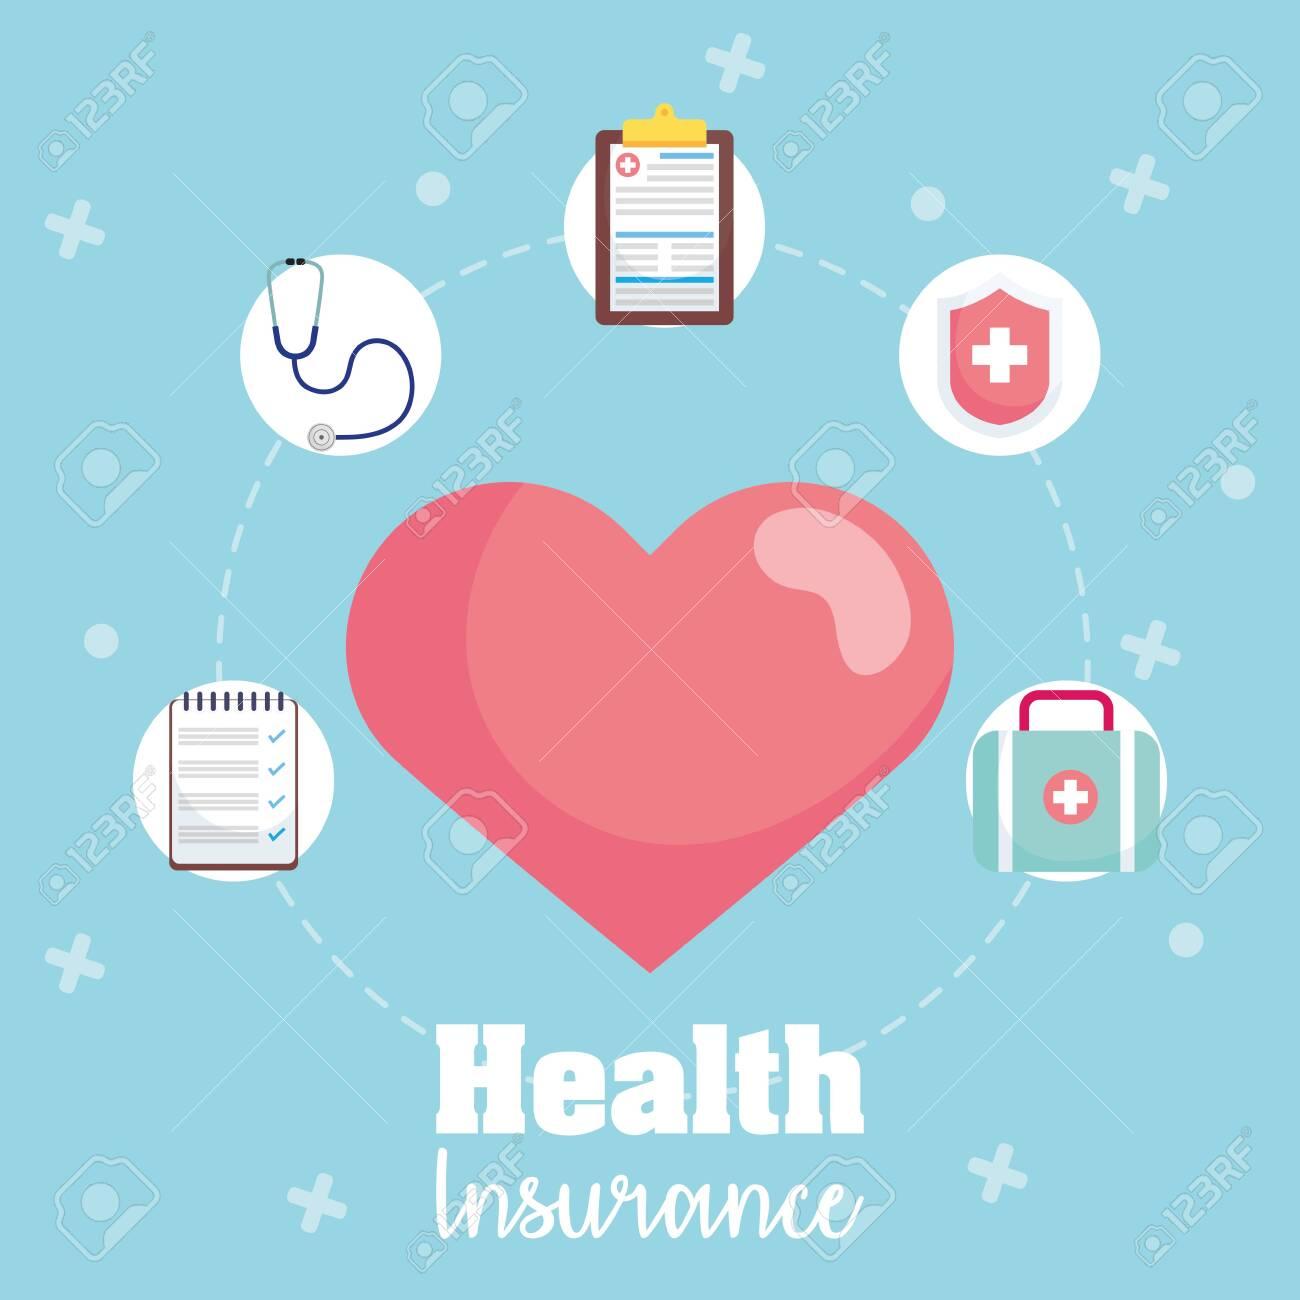 health insurance service with heart cardio vector illustration design - 153856707